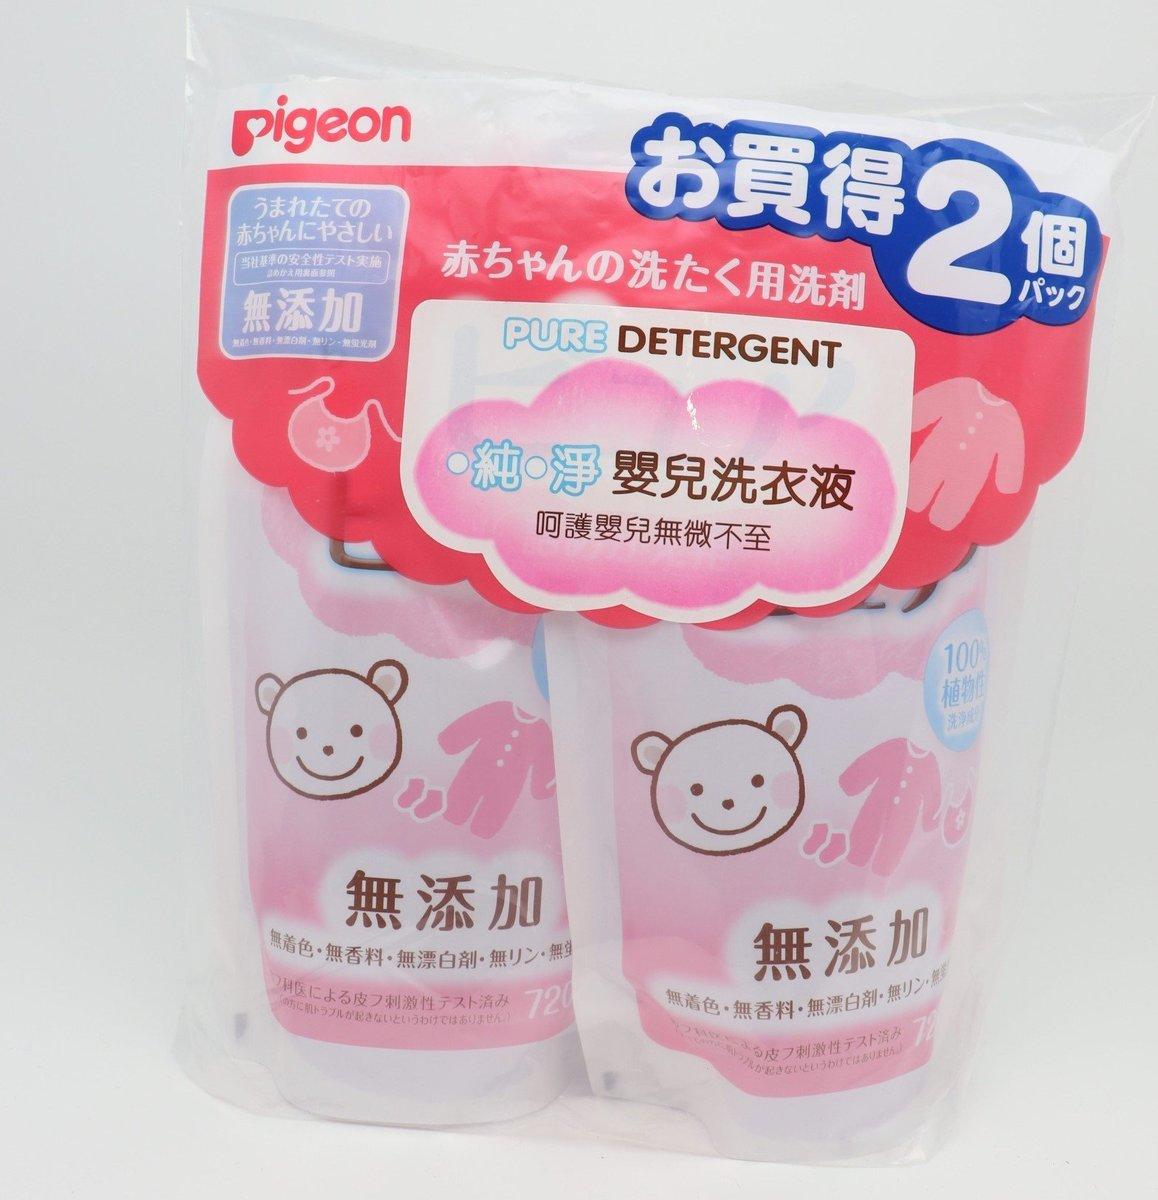 Pigeon貝親嬰兒溫和洗衣液720ml補充裝X2